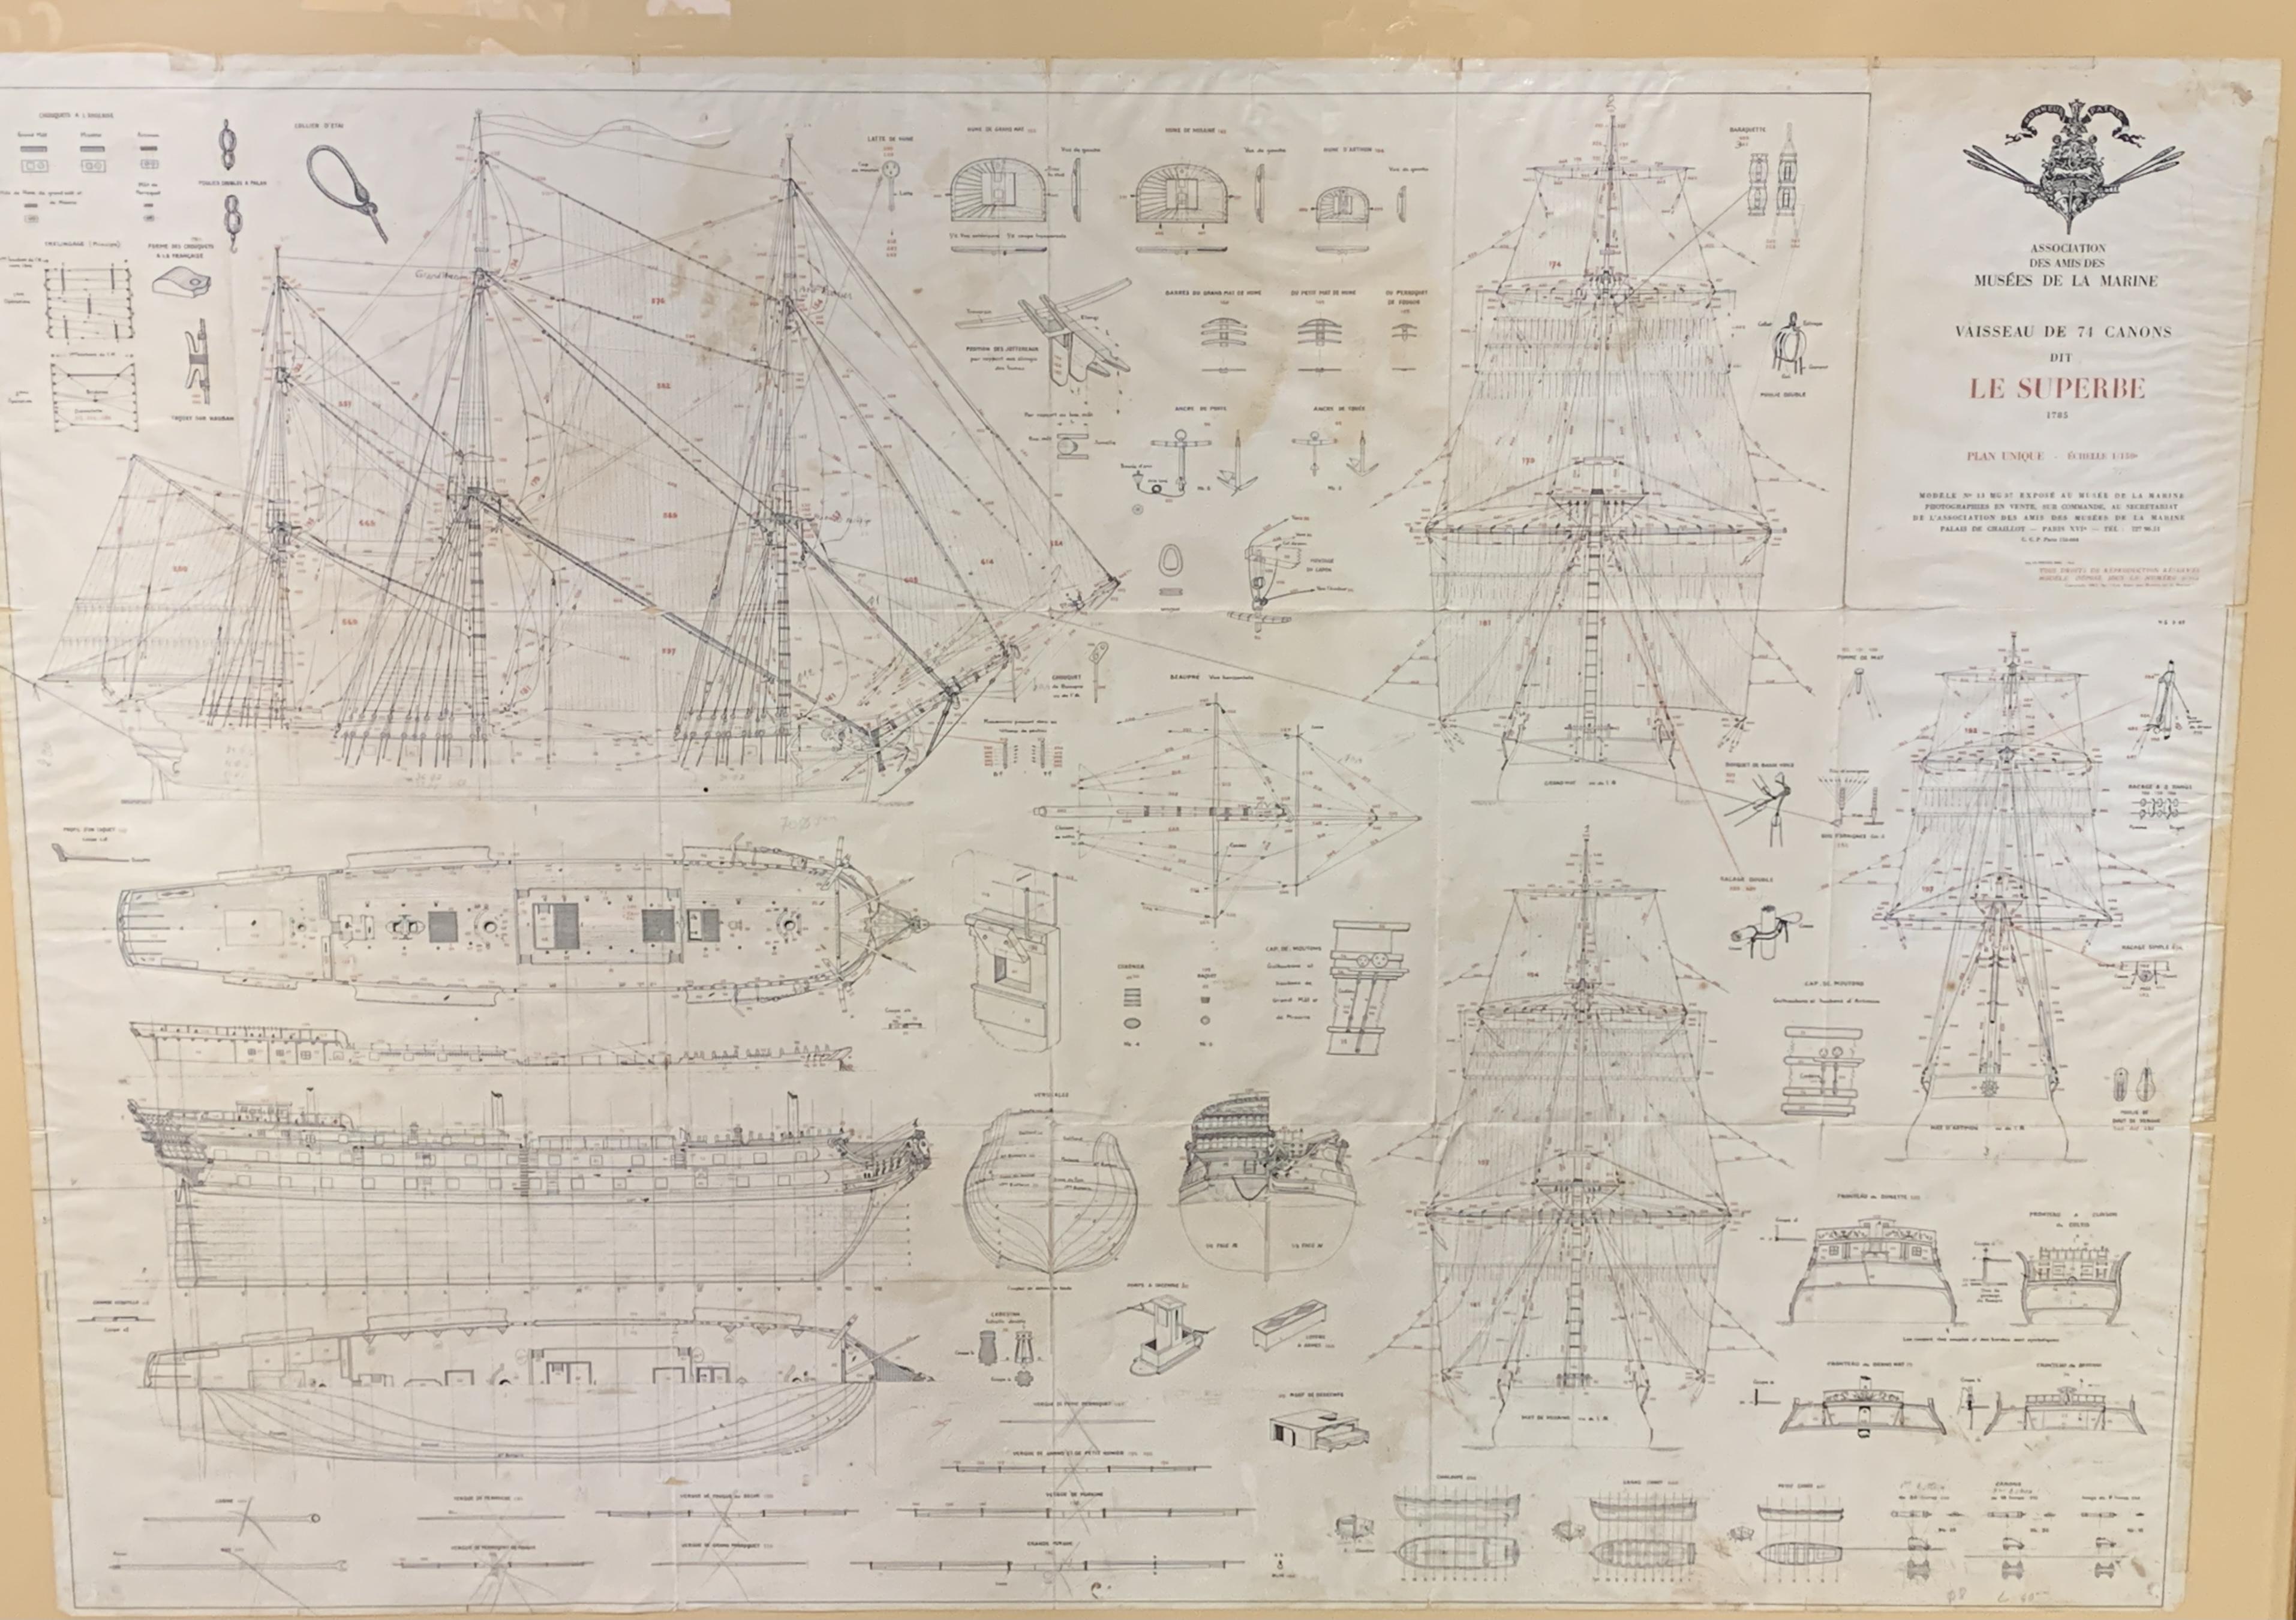 A Musee de La Marie, 1/150 scale plan of the 74 gun warship Le Superbe